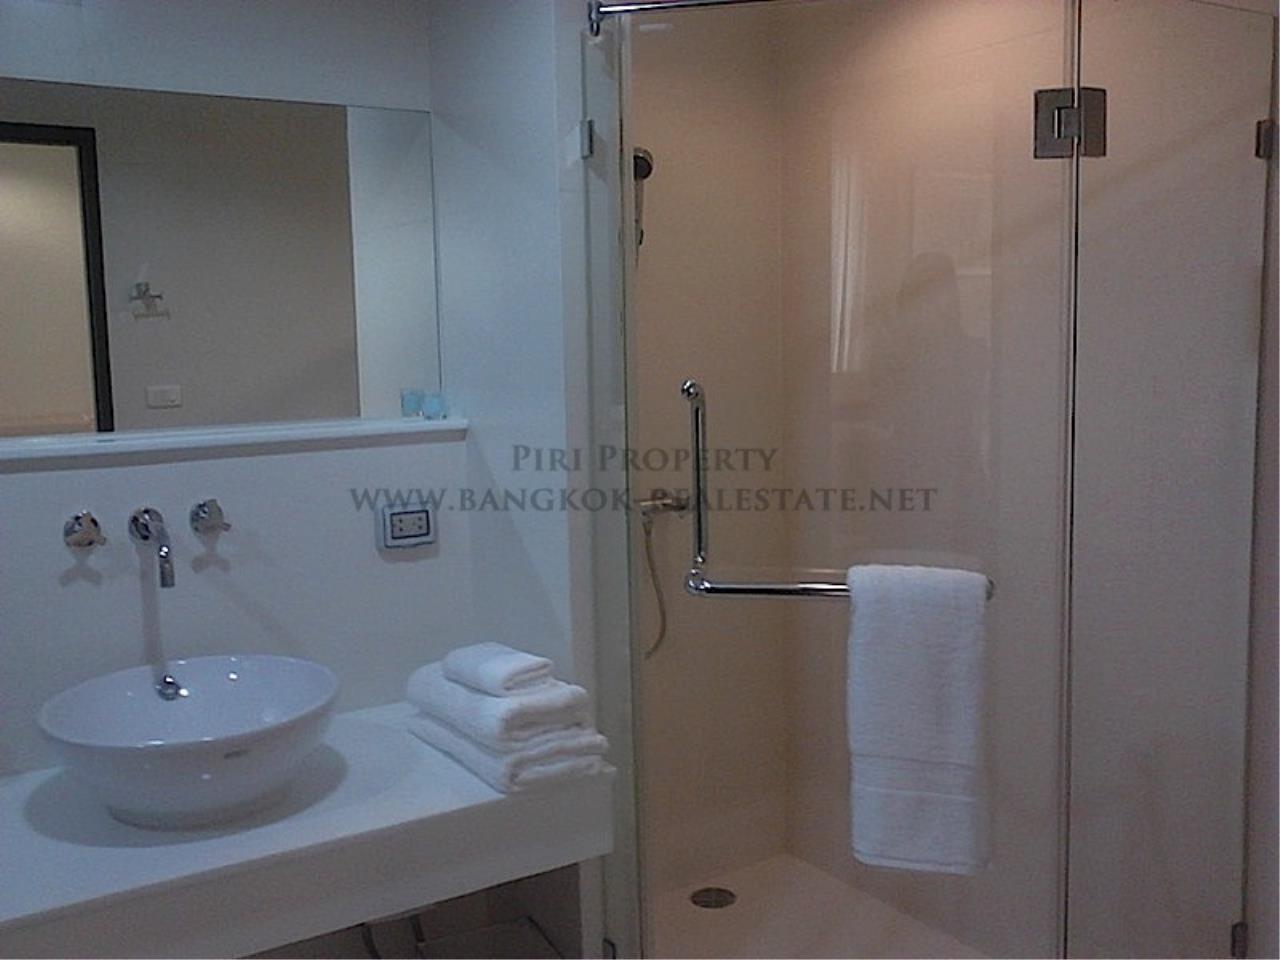 Piri Property Agency's The Address 42 - Spacious 2 Bedroom Unit 6